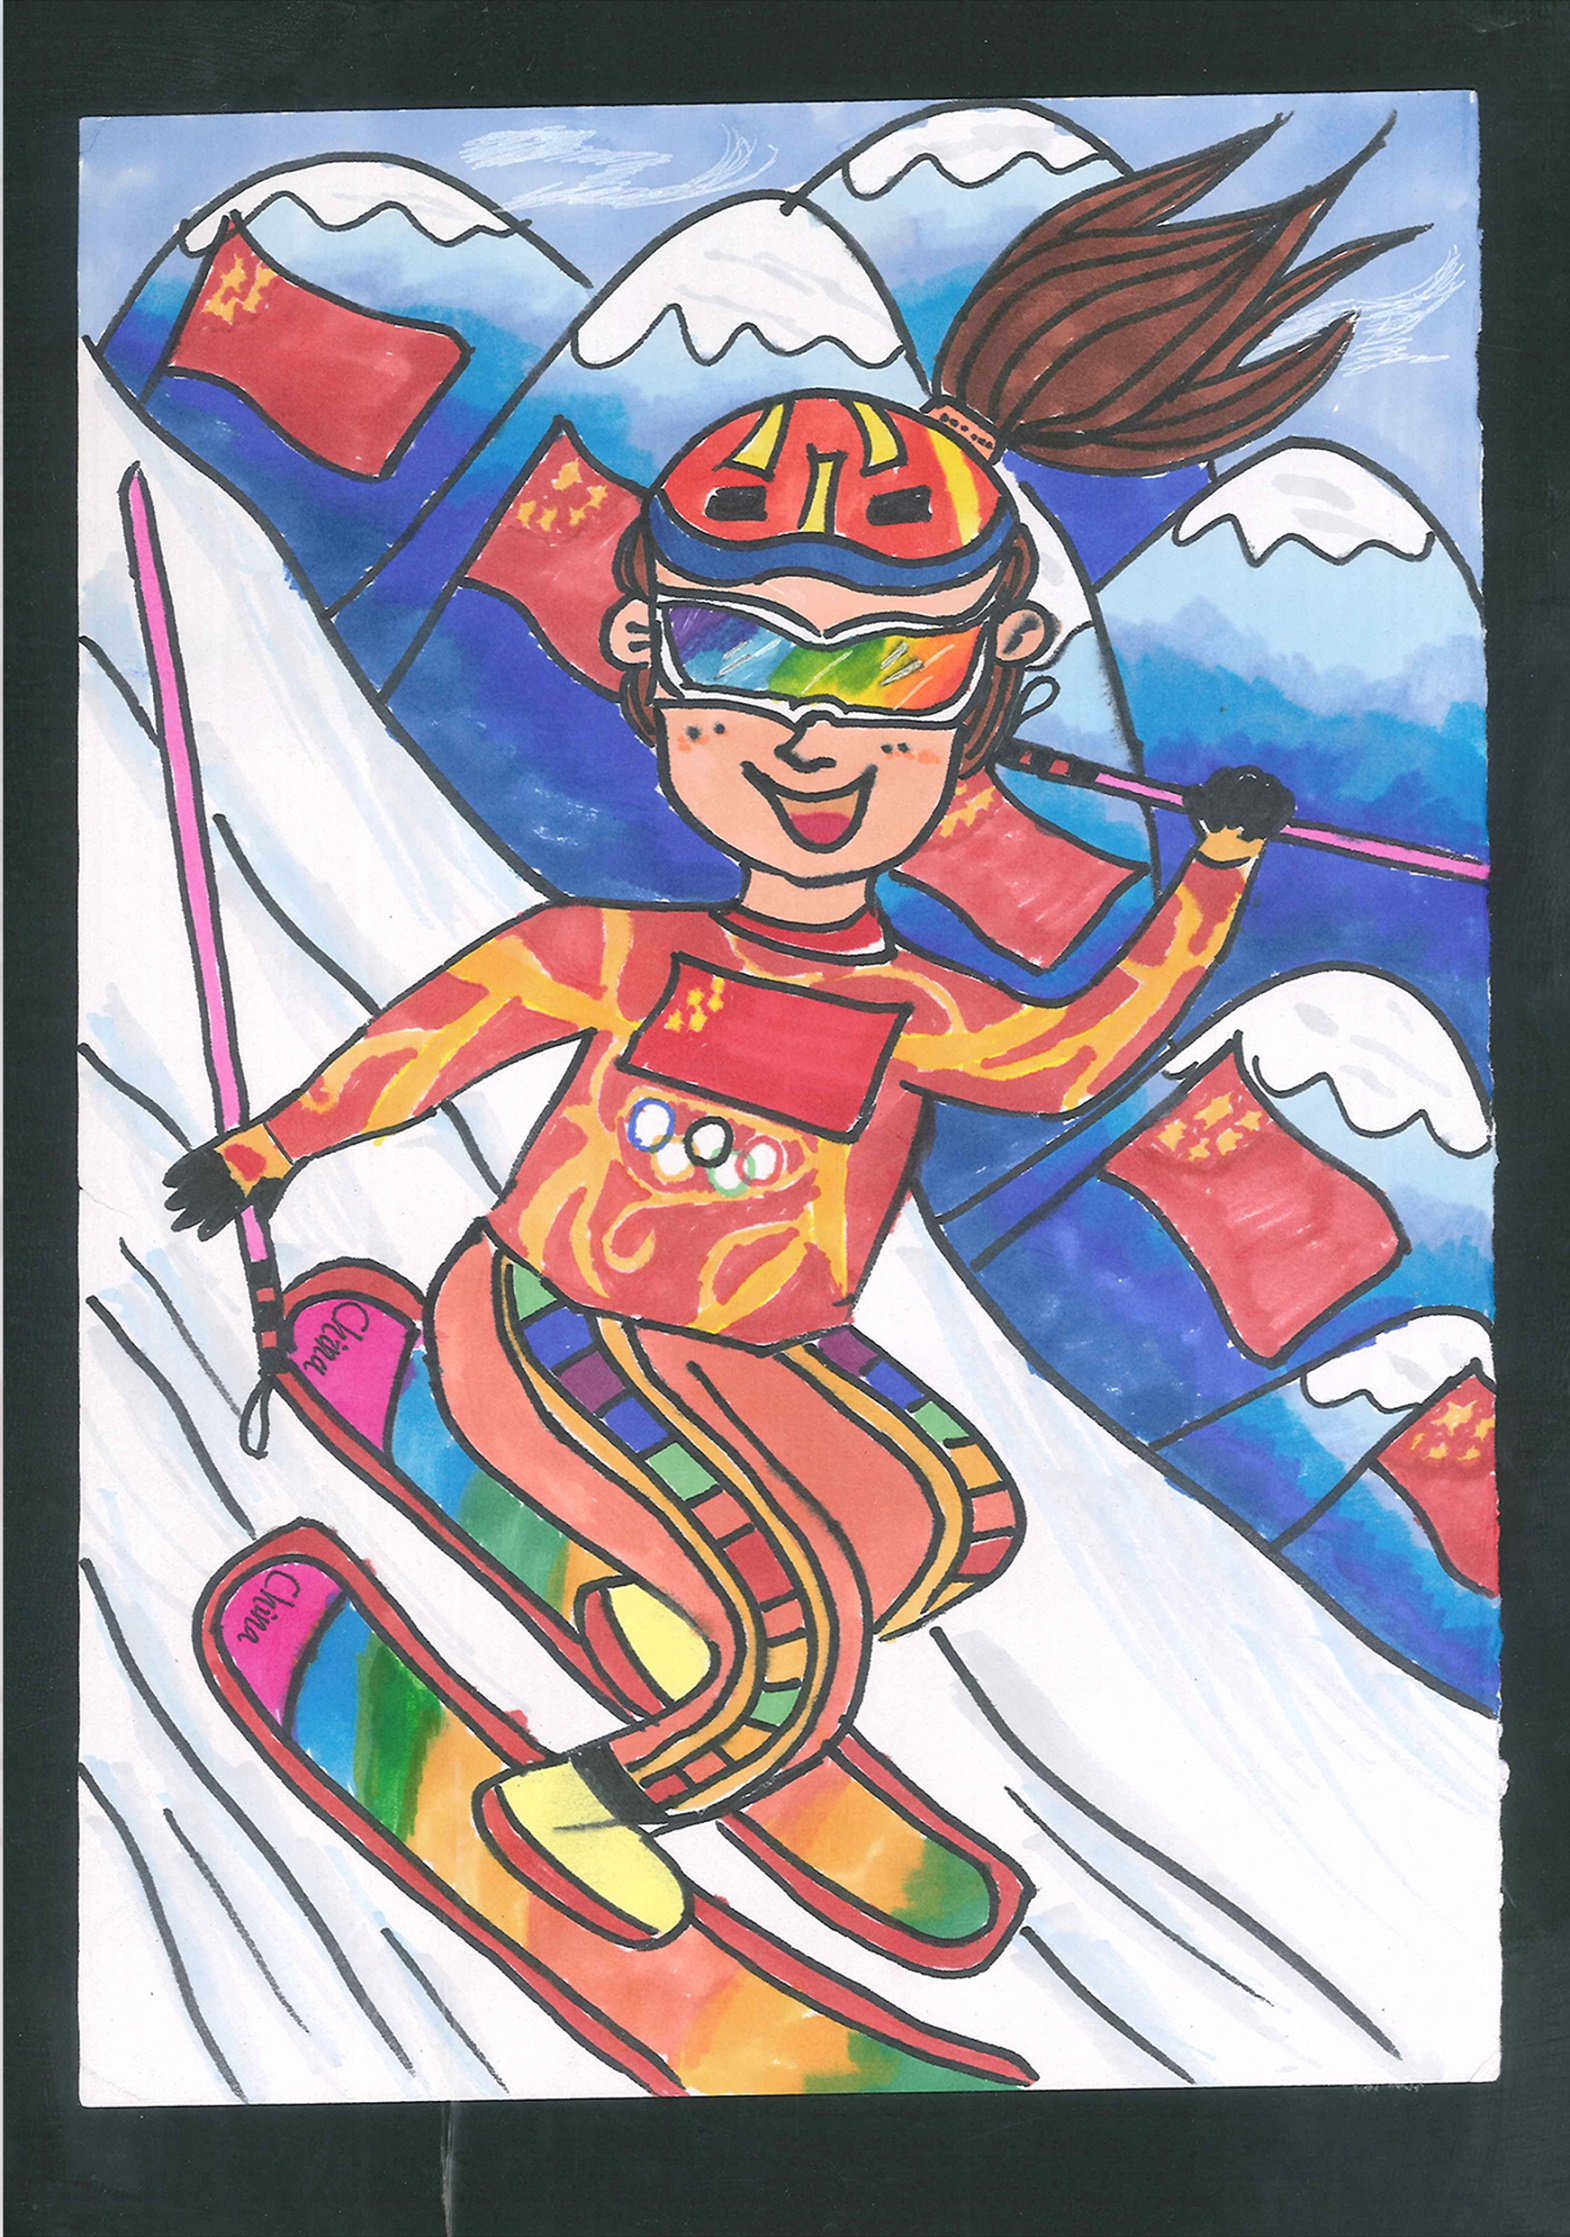 助力冬奥 Inspire The Winter Olympics+孙高晅 Sun Gaoxuan